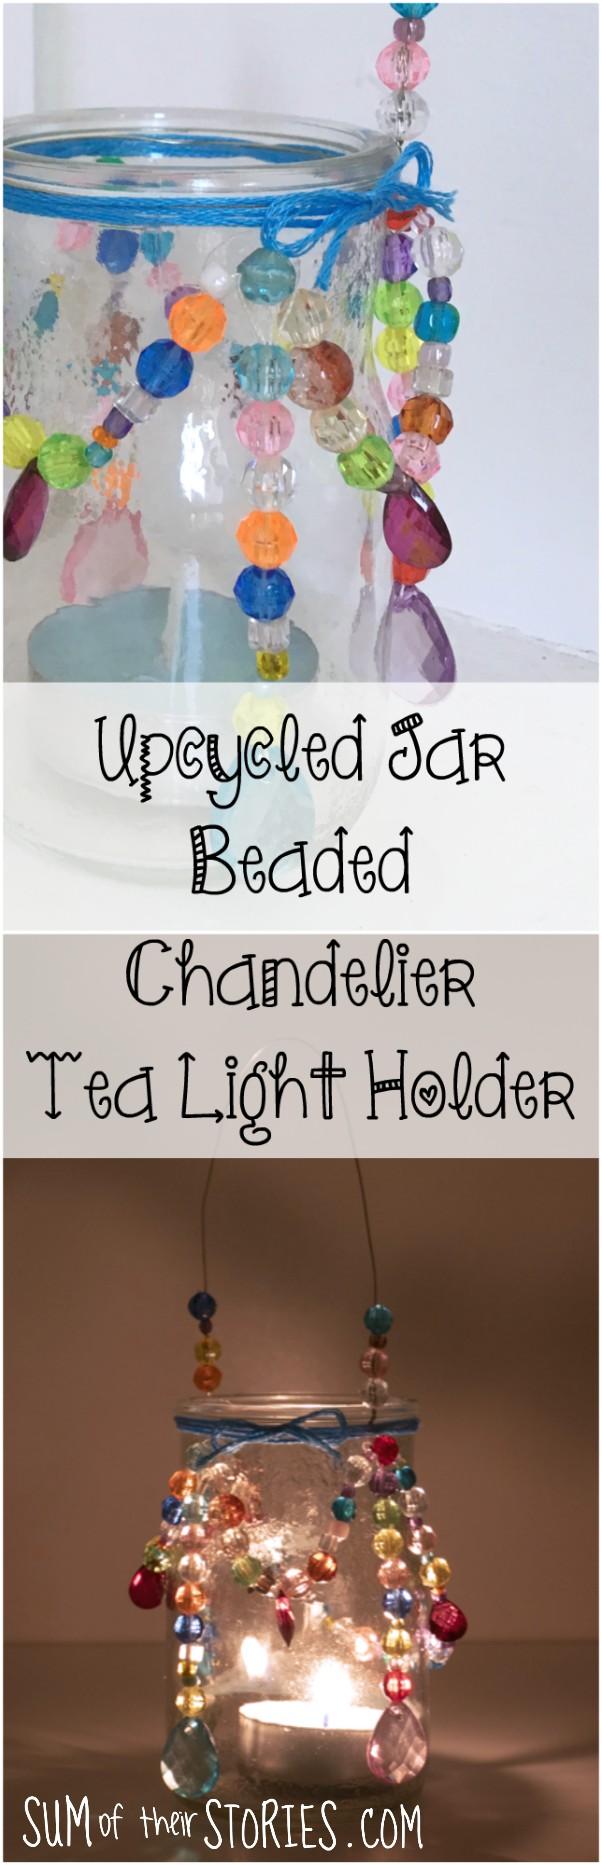 upcycled jar beaded chandelier tea light holder